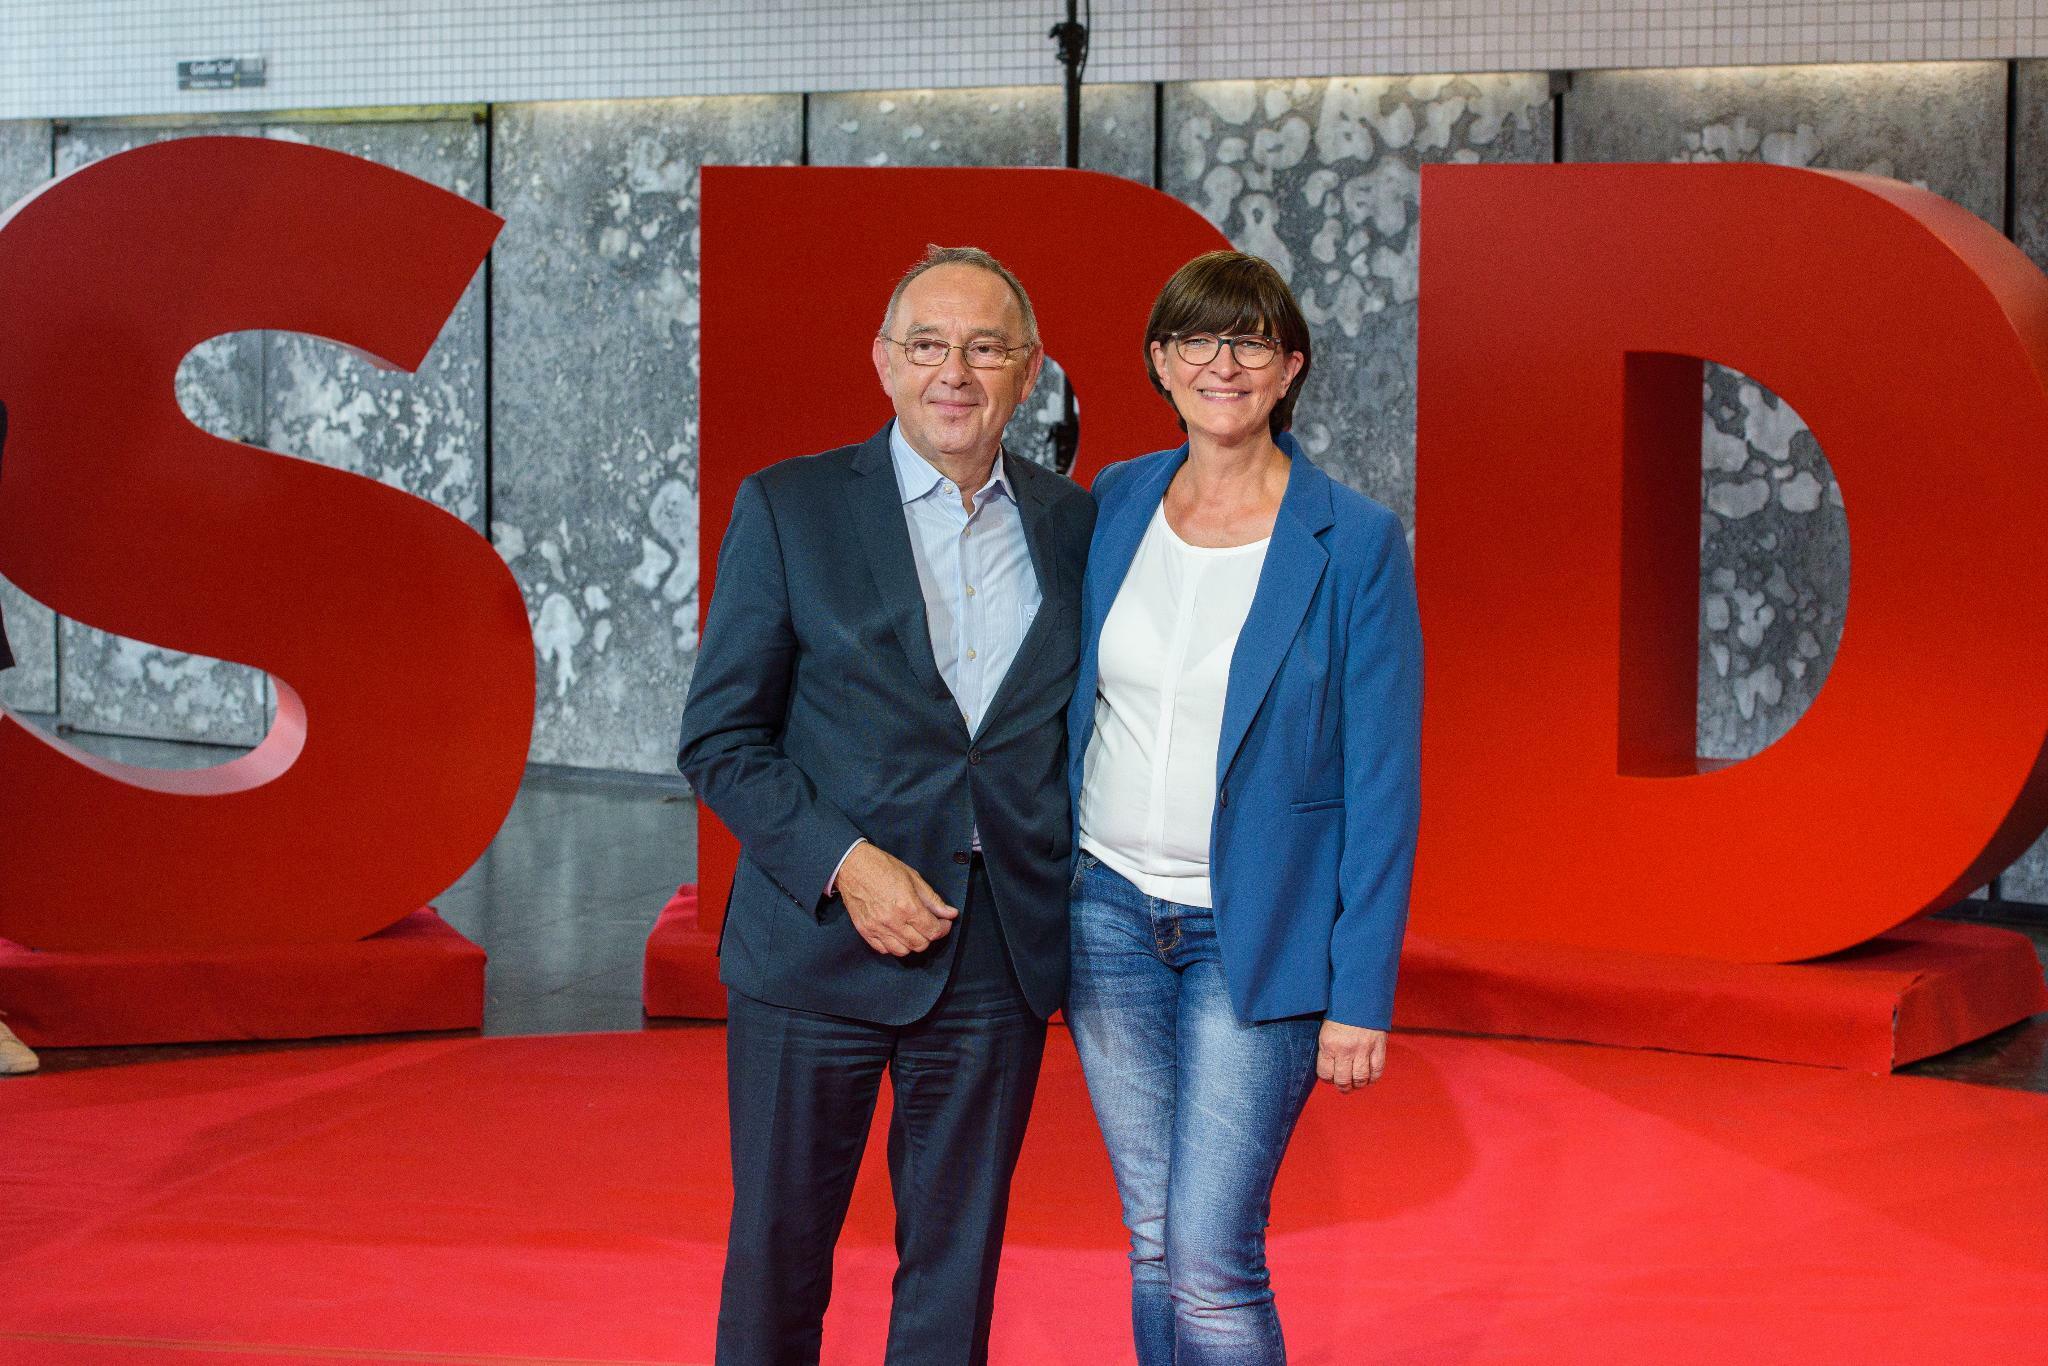 SPD-Kandidatenduo Walter-Borjans/Esken will Steuersystem radikal umbauen